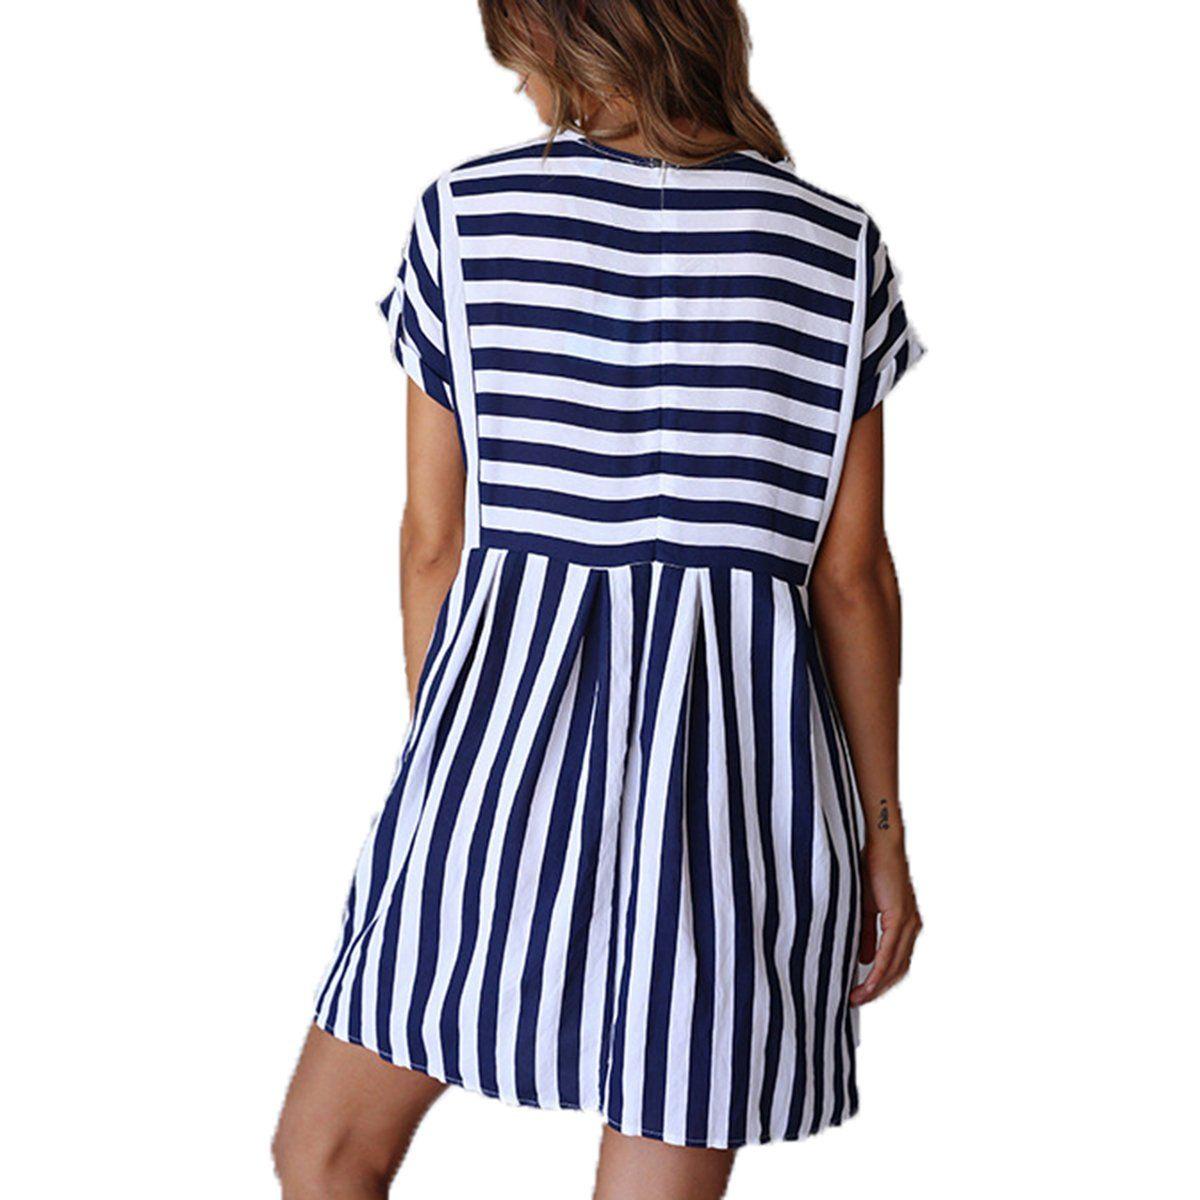 cf5edbac100d ChongXiao Women Stiped Dress Casual Cute Short Sleeve ONeck Mini Summer  Dresses for Women Blue M